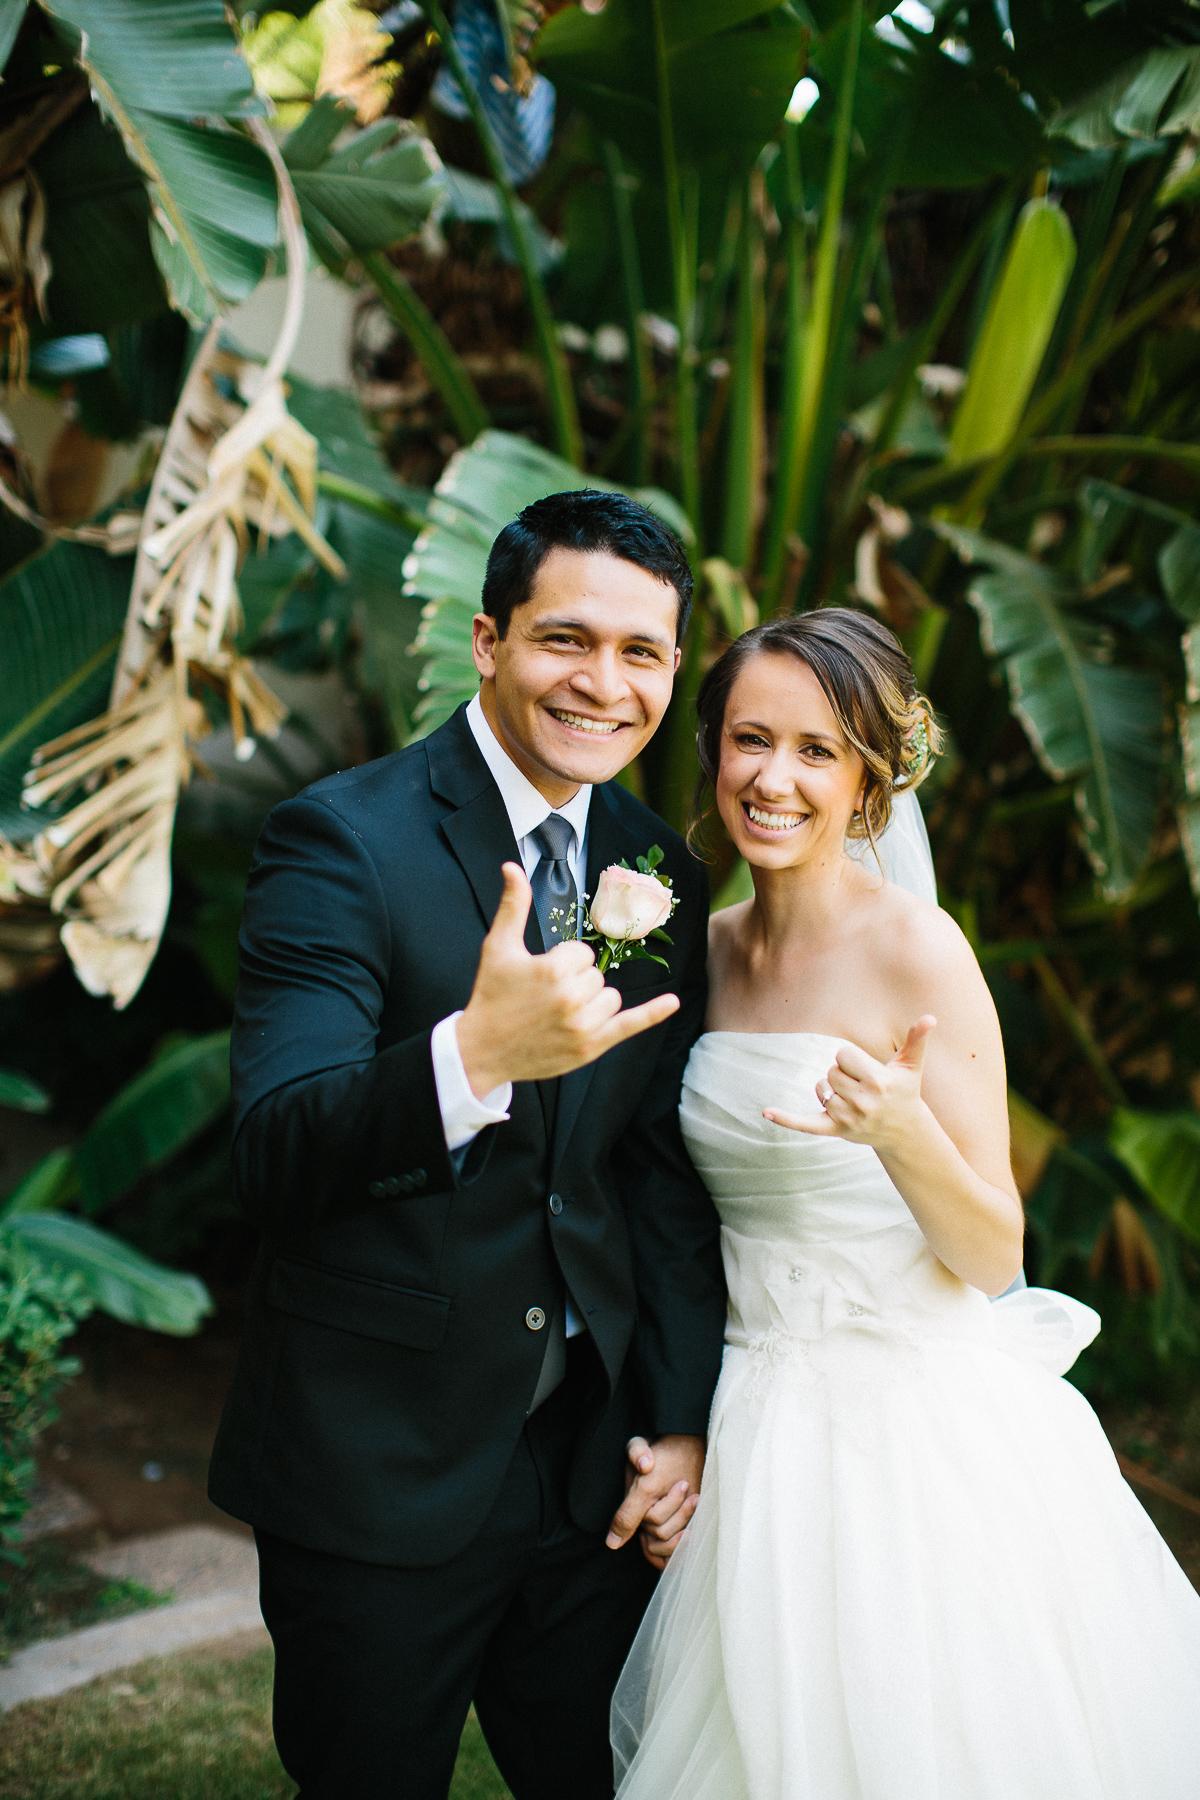 170708-Luxium-Weddings-Arizona-Sheraton-Phoenix-Arizona-Photographer-Hilton-Hawaiian-1014.jpg